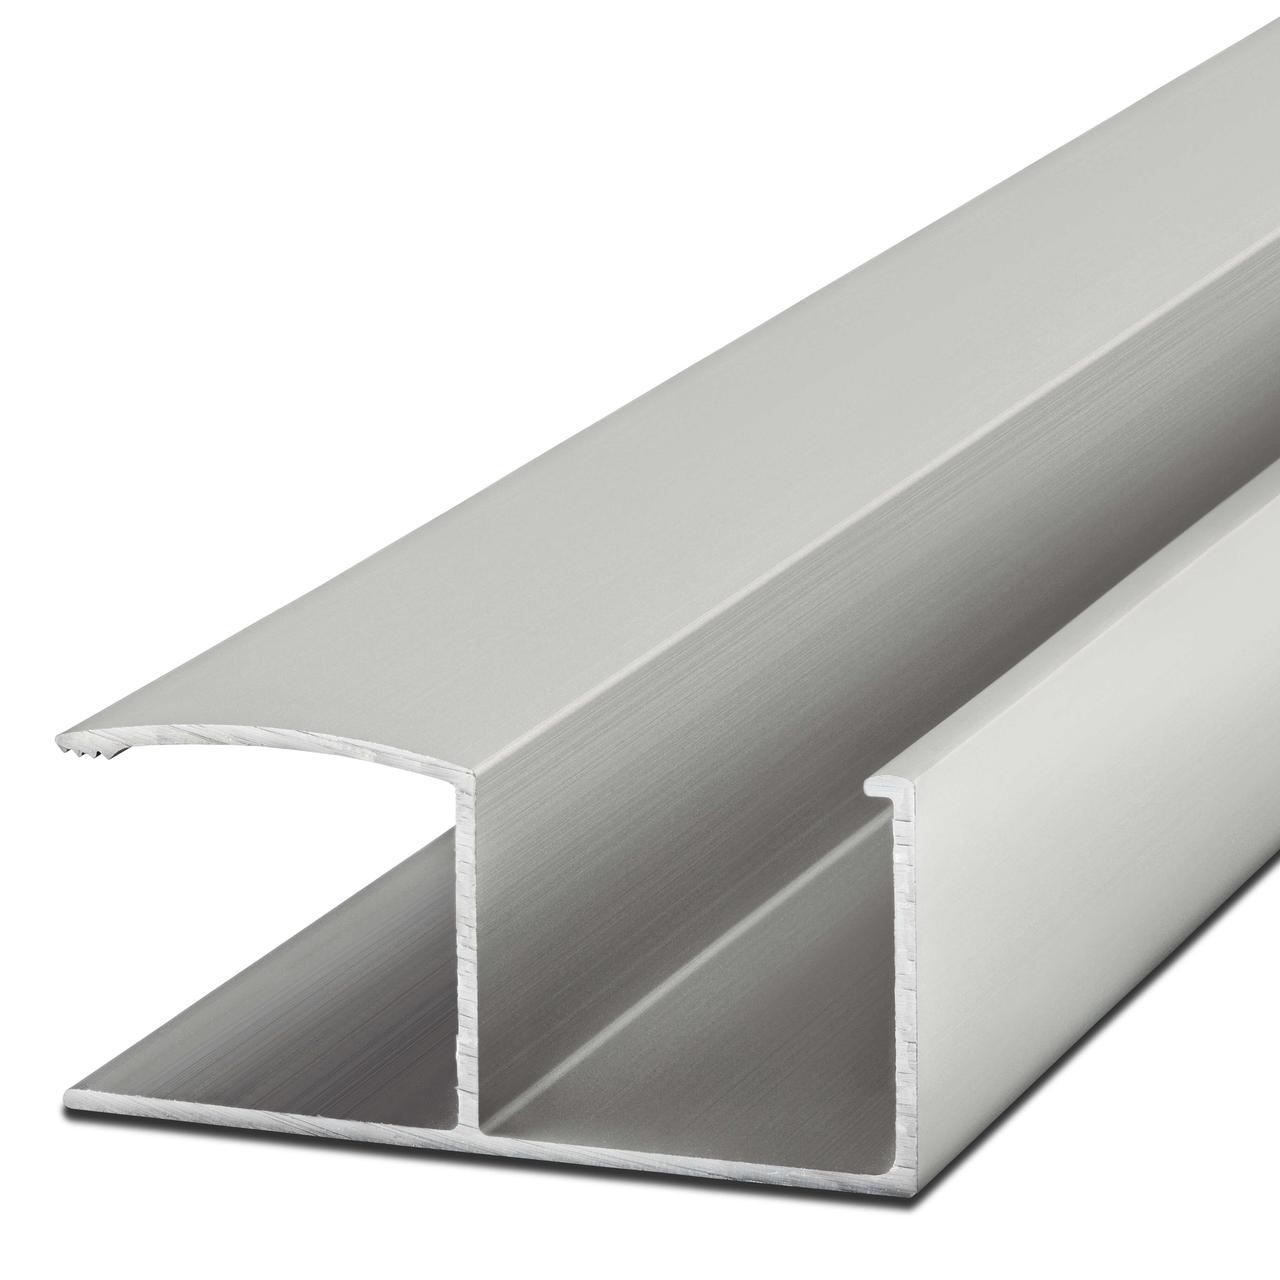 Ручка-профиль 18мм. AL-18-1 2.7м. алюминий